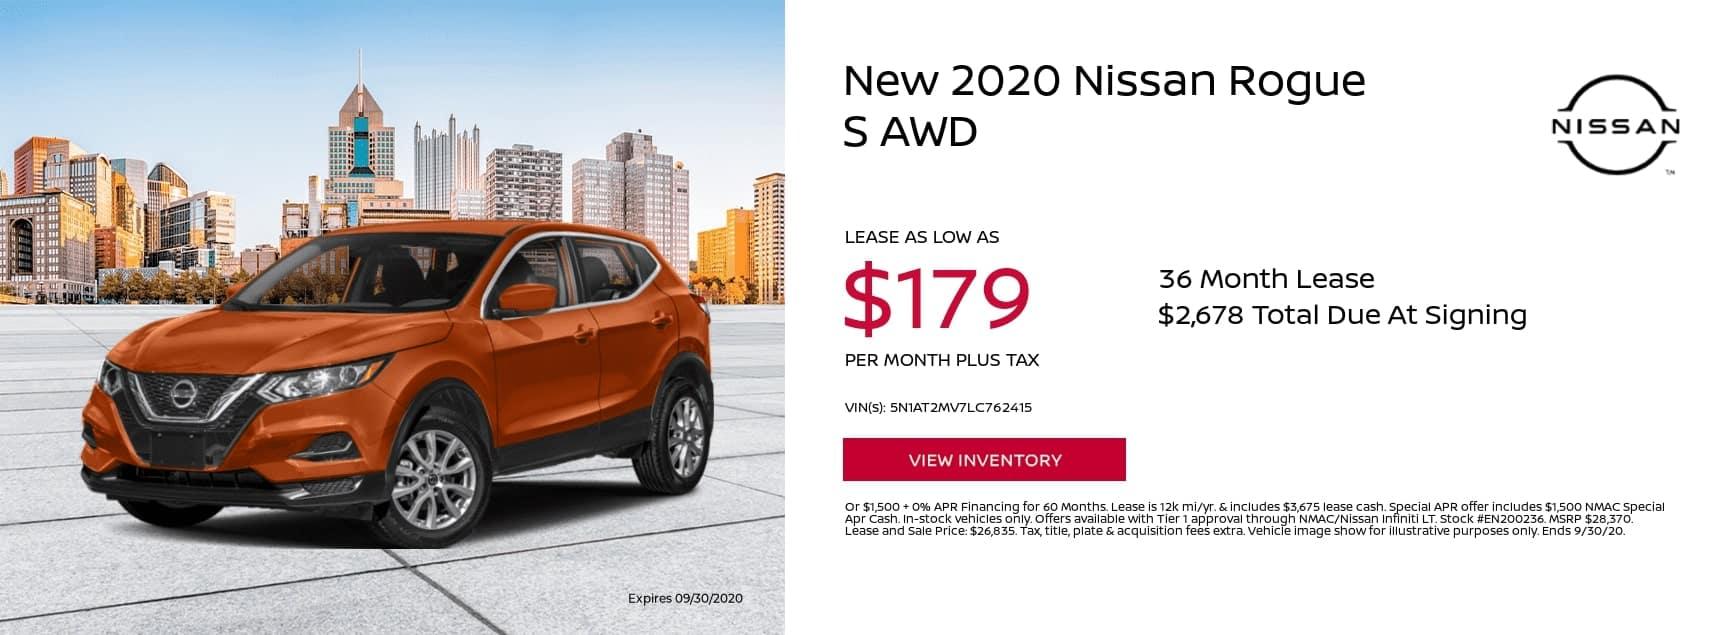 2020-Nissan-Rogue-S-AWD-25